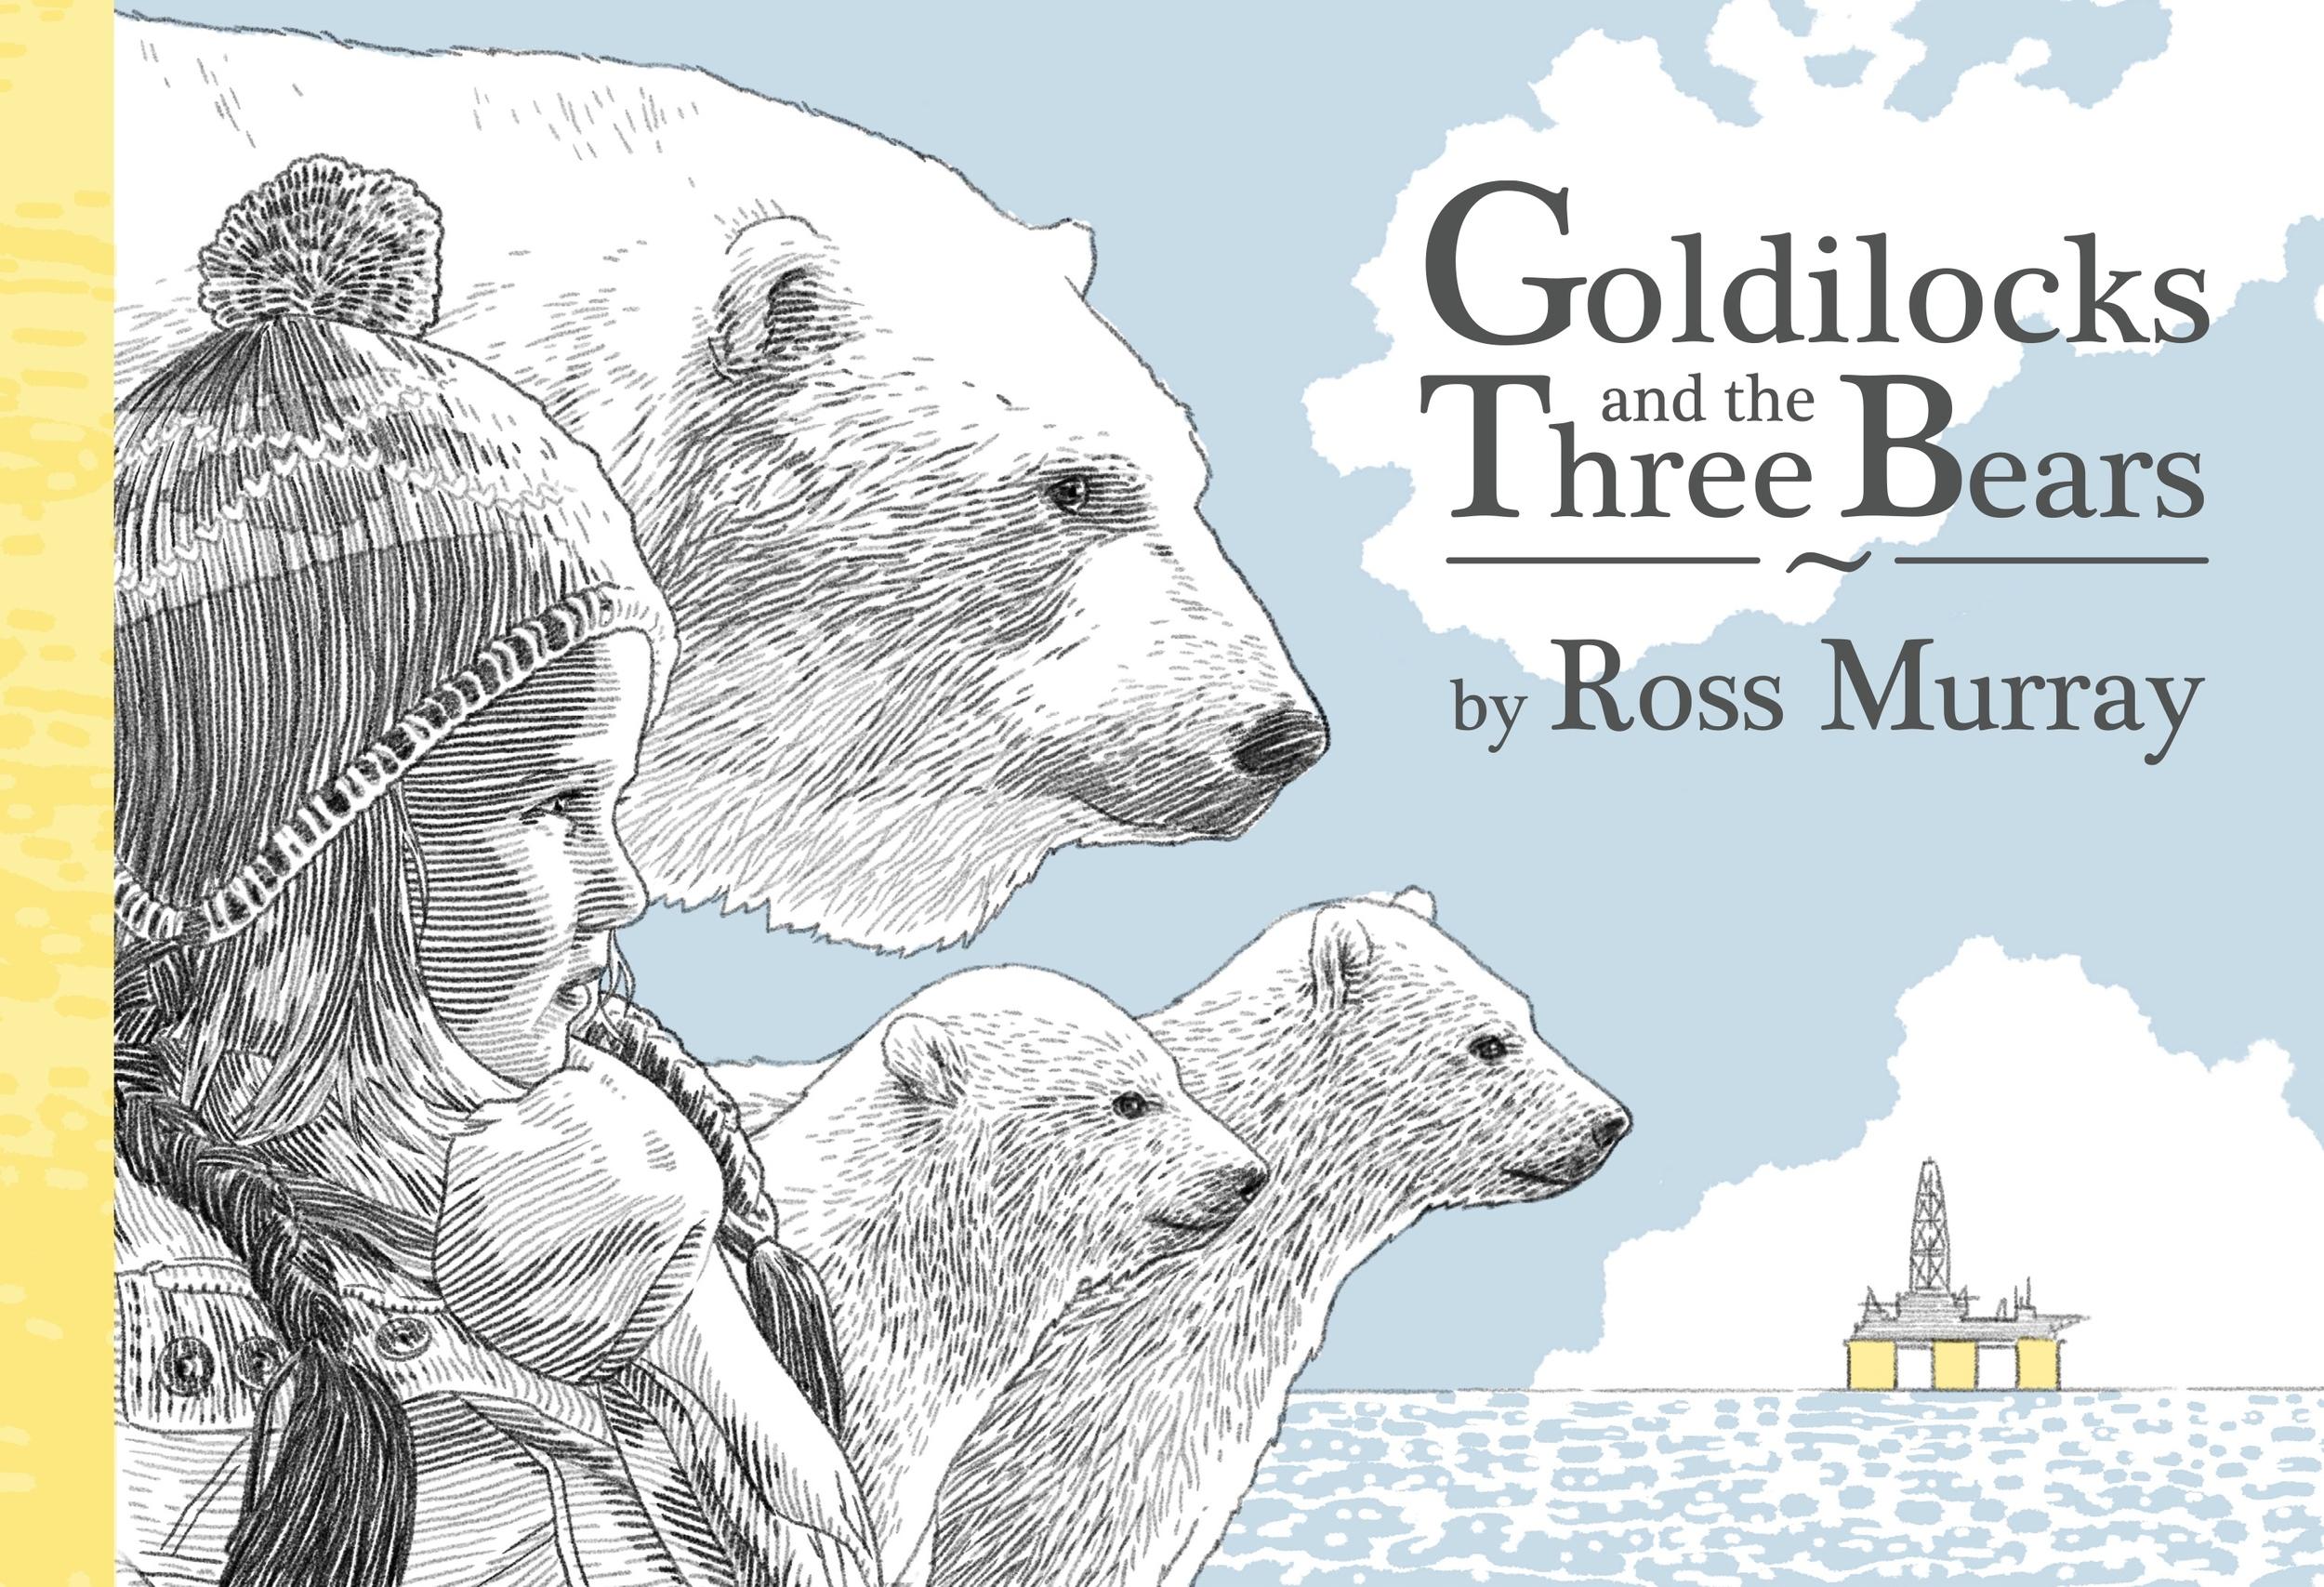 Ross Murray's cover art Goldilocks and the Three Bears